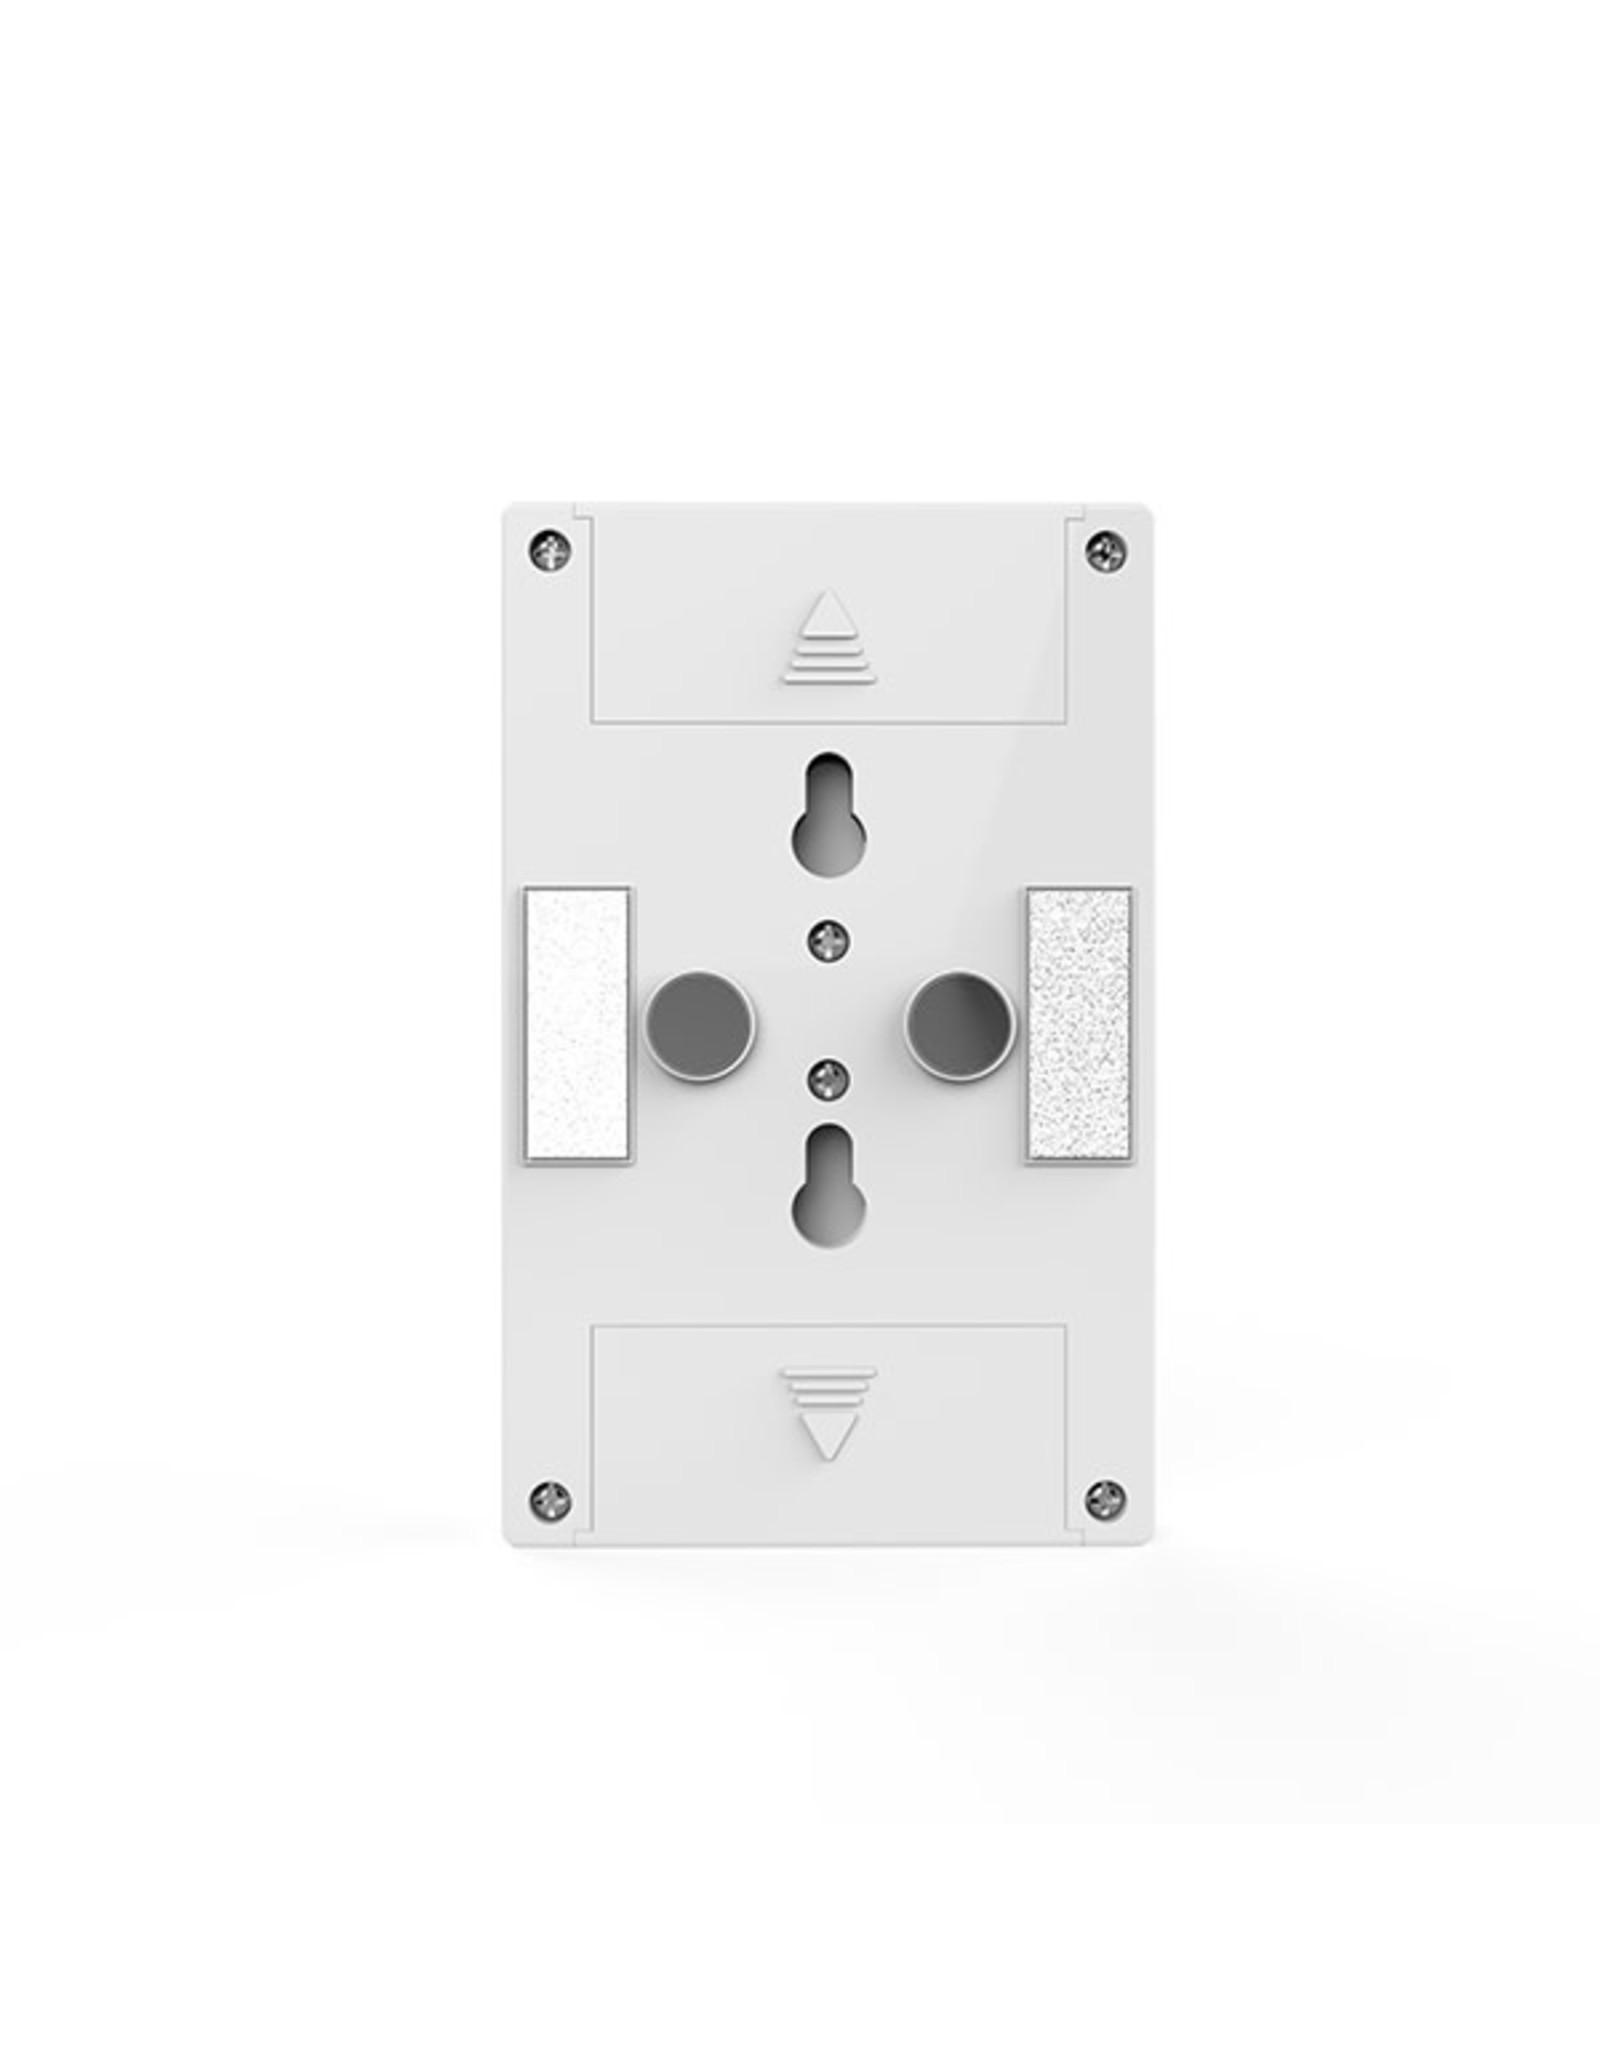 Flipit Light & Switch - 2 Pack